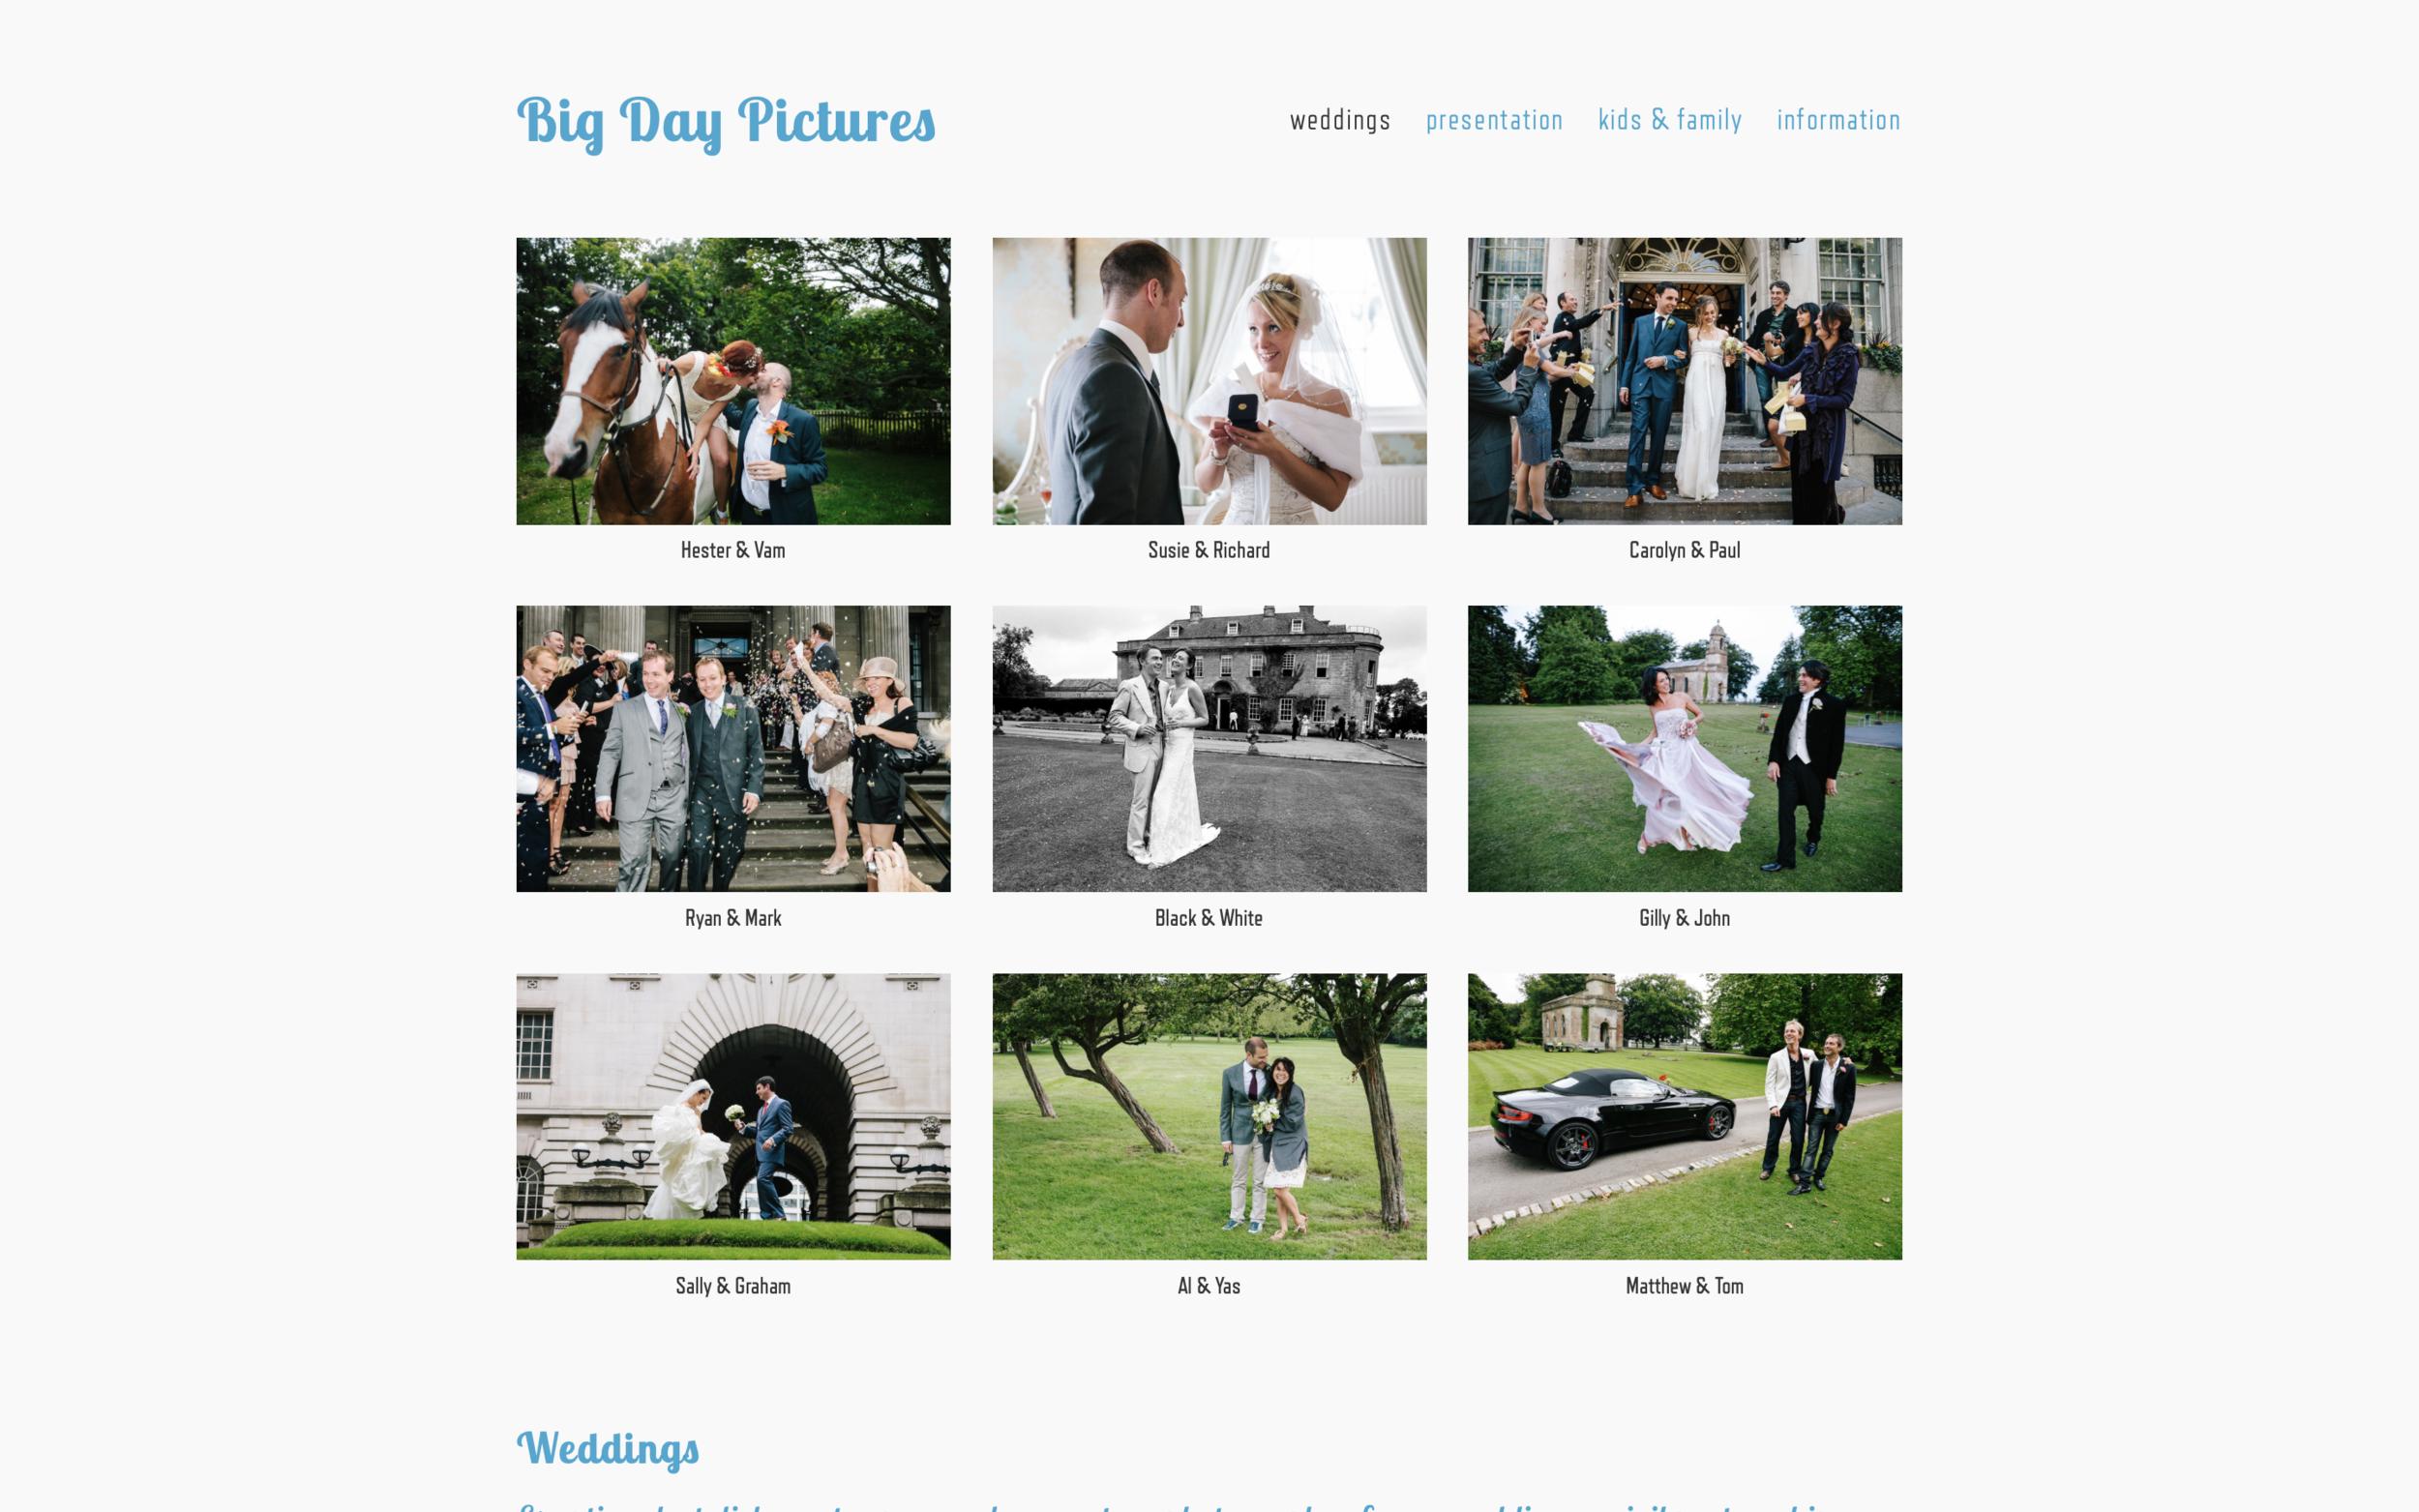 bigdaypictures.com